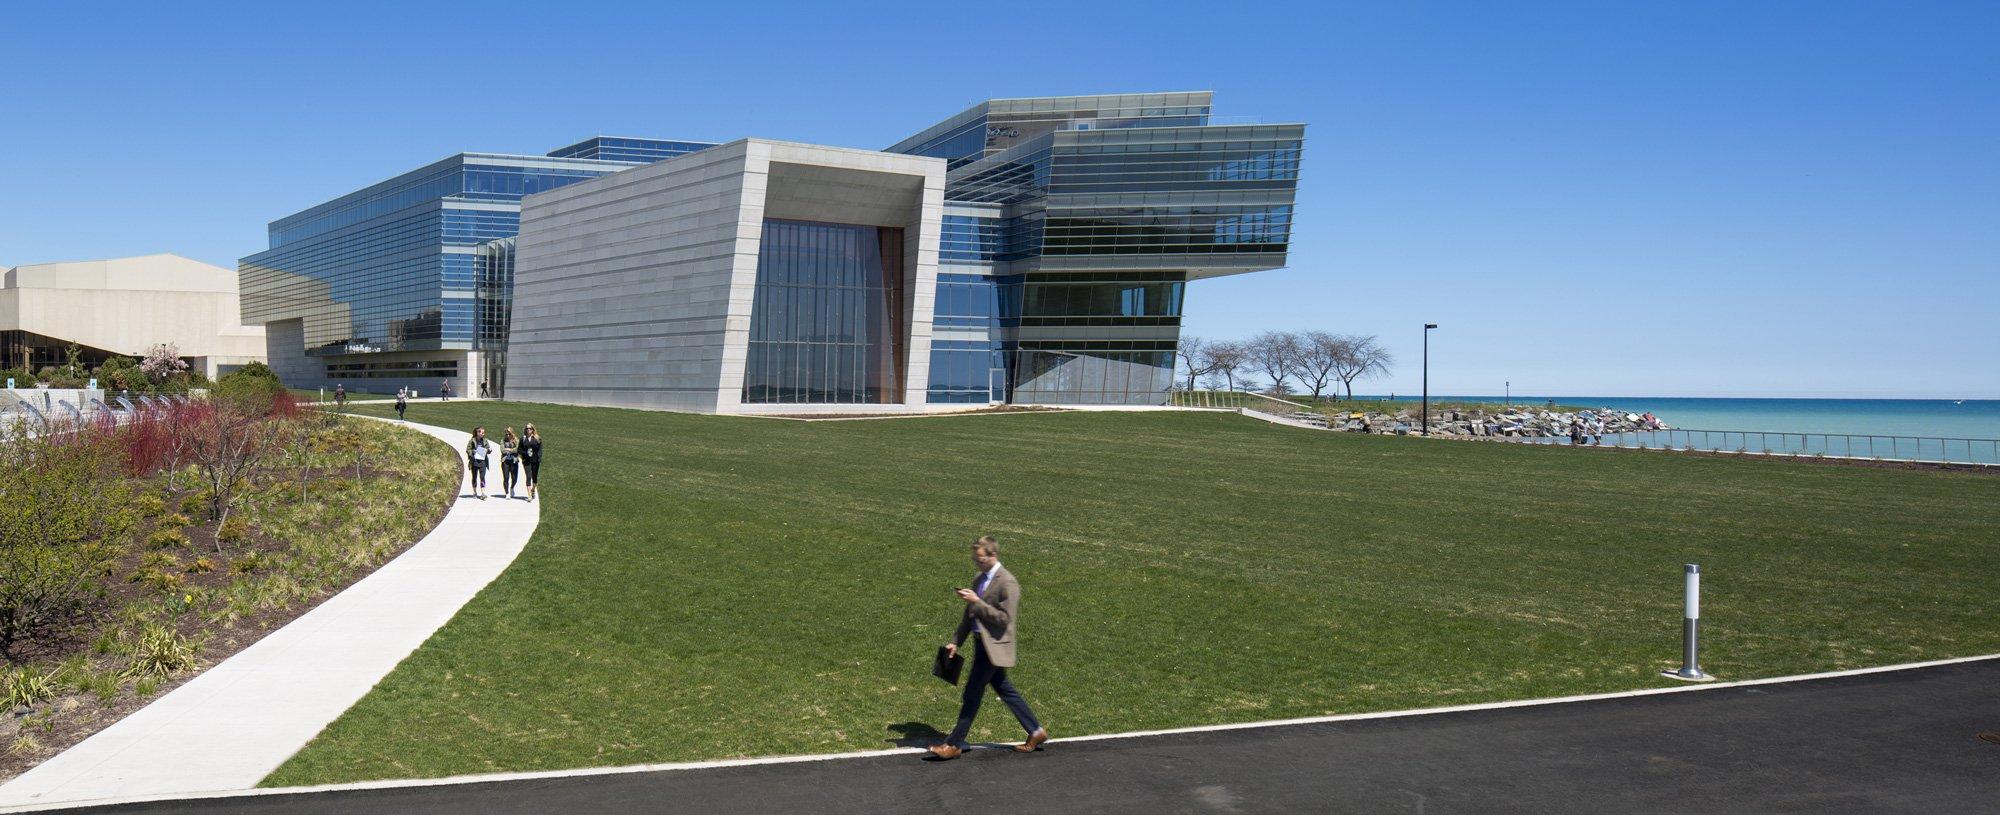 Patrick G. and Shirley W. Ryan Center for the Musical Arts presso la Northwestern University © Tom Rossiter